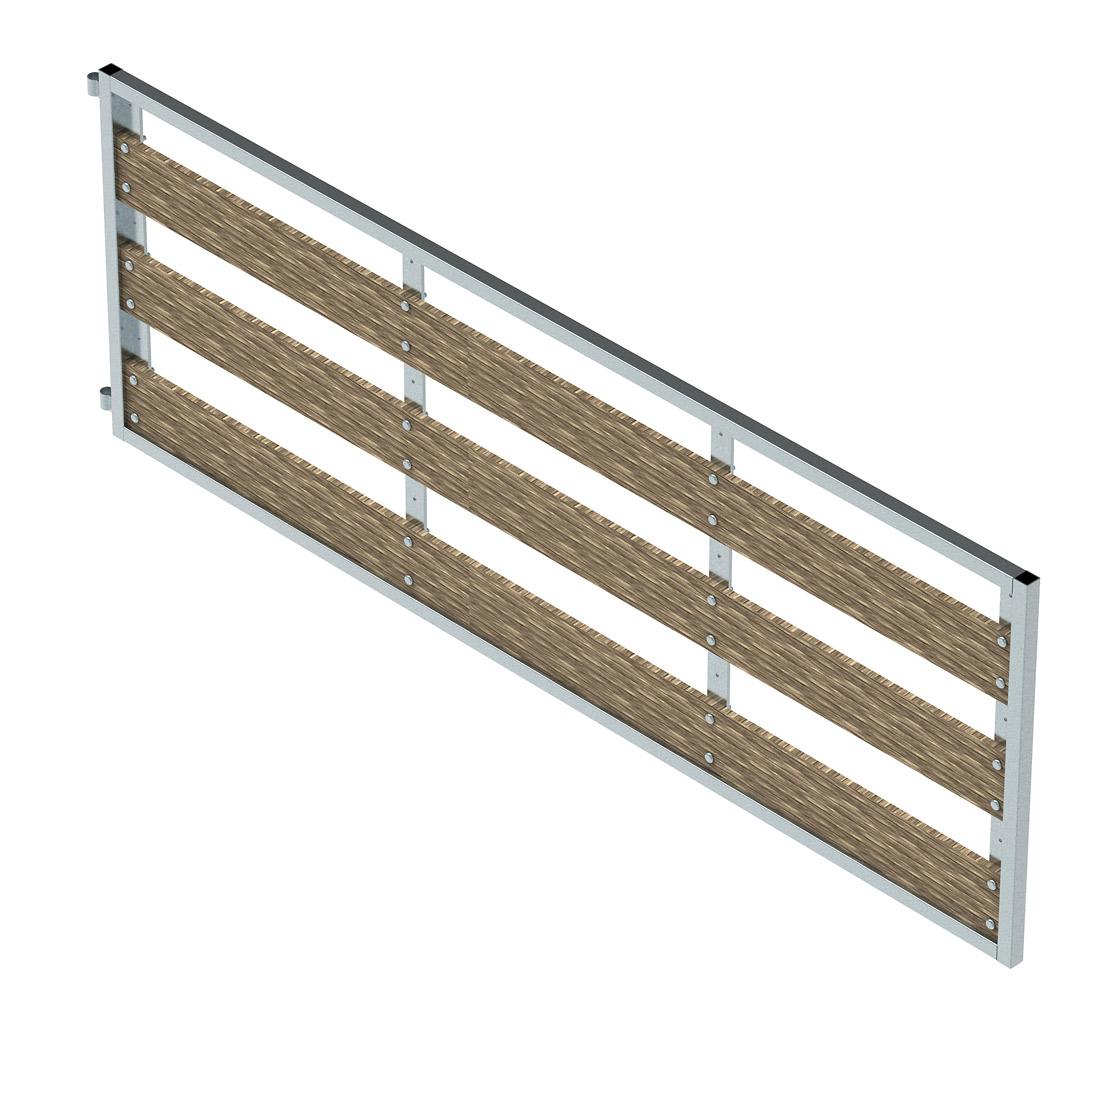 Sheepyard gate 2400mm x 850mm (frame only)